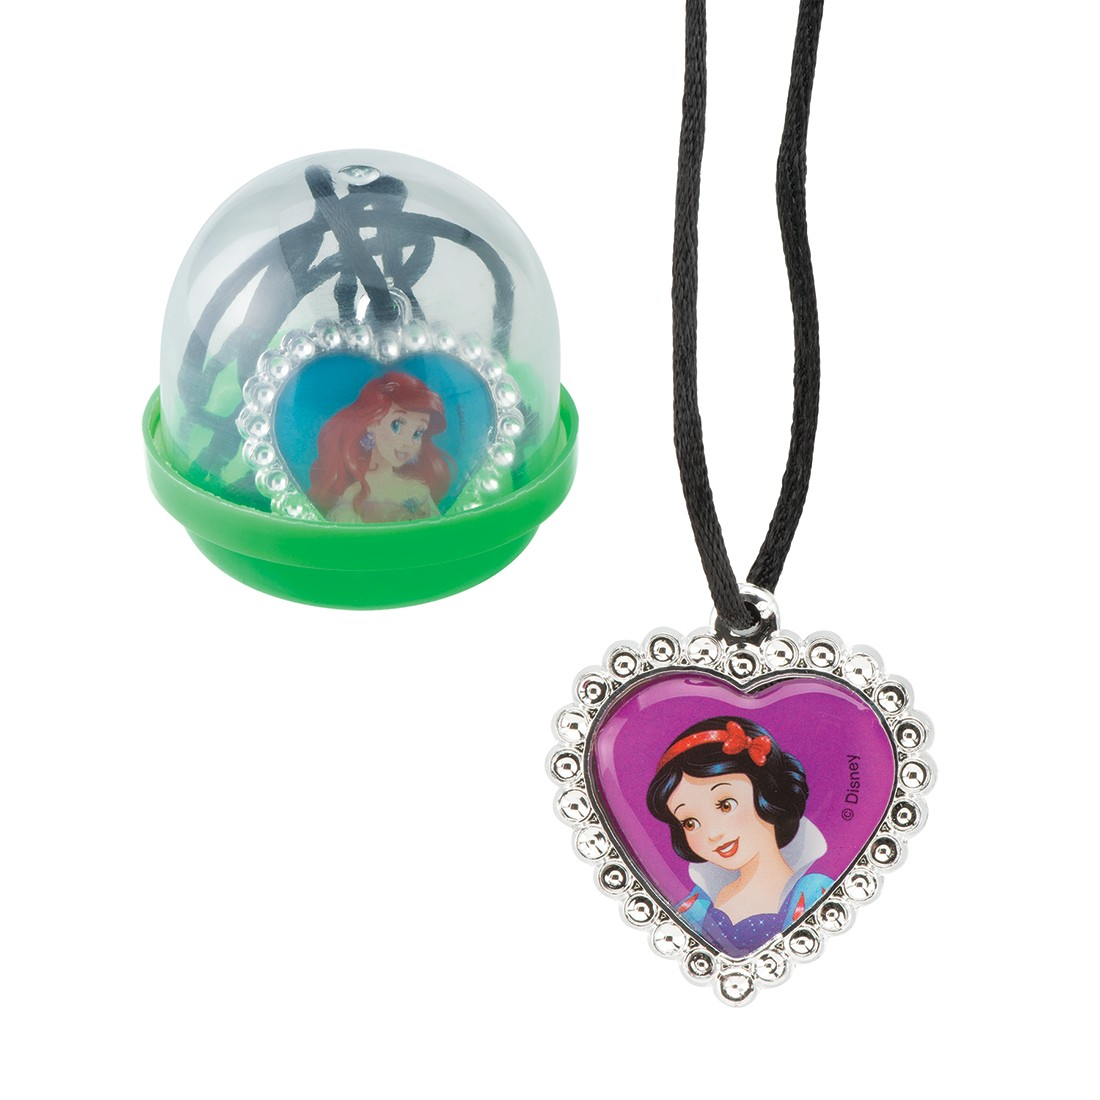 "Disney Princess Jewel Necklaces in 2"" Capsules [image]"